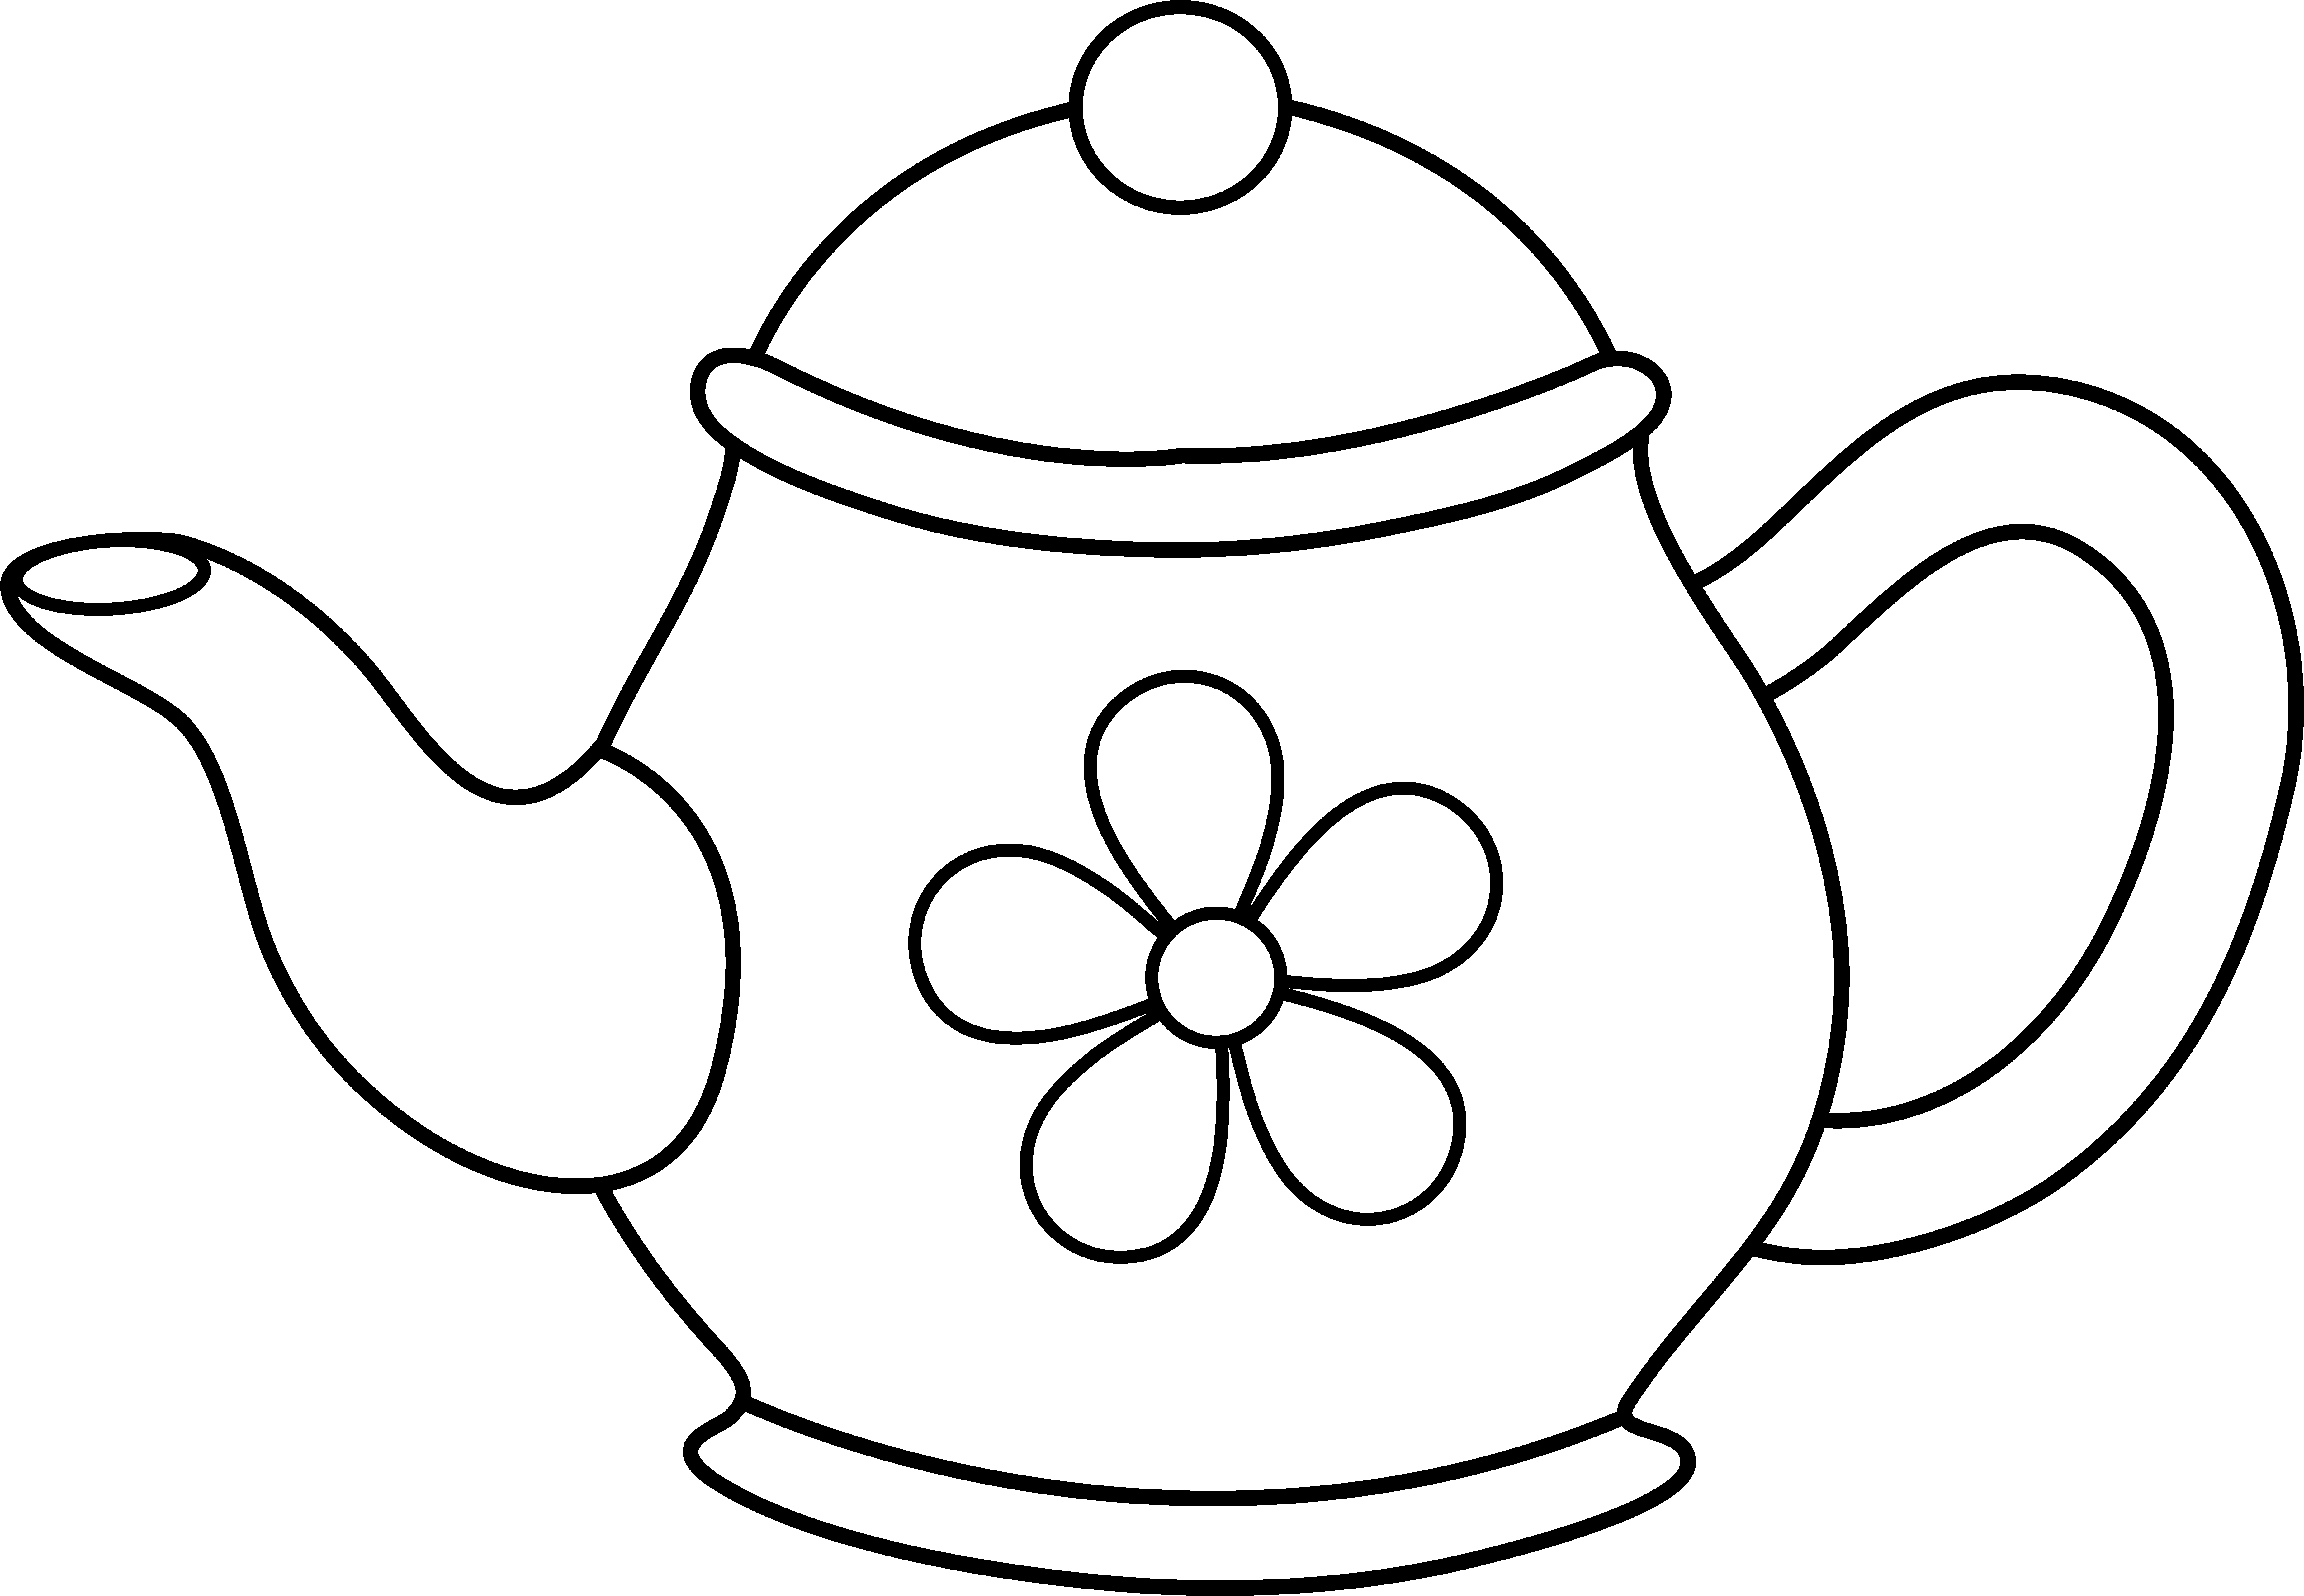 Clip art images panda. Cups clipart teapot